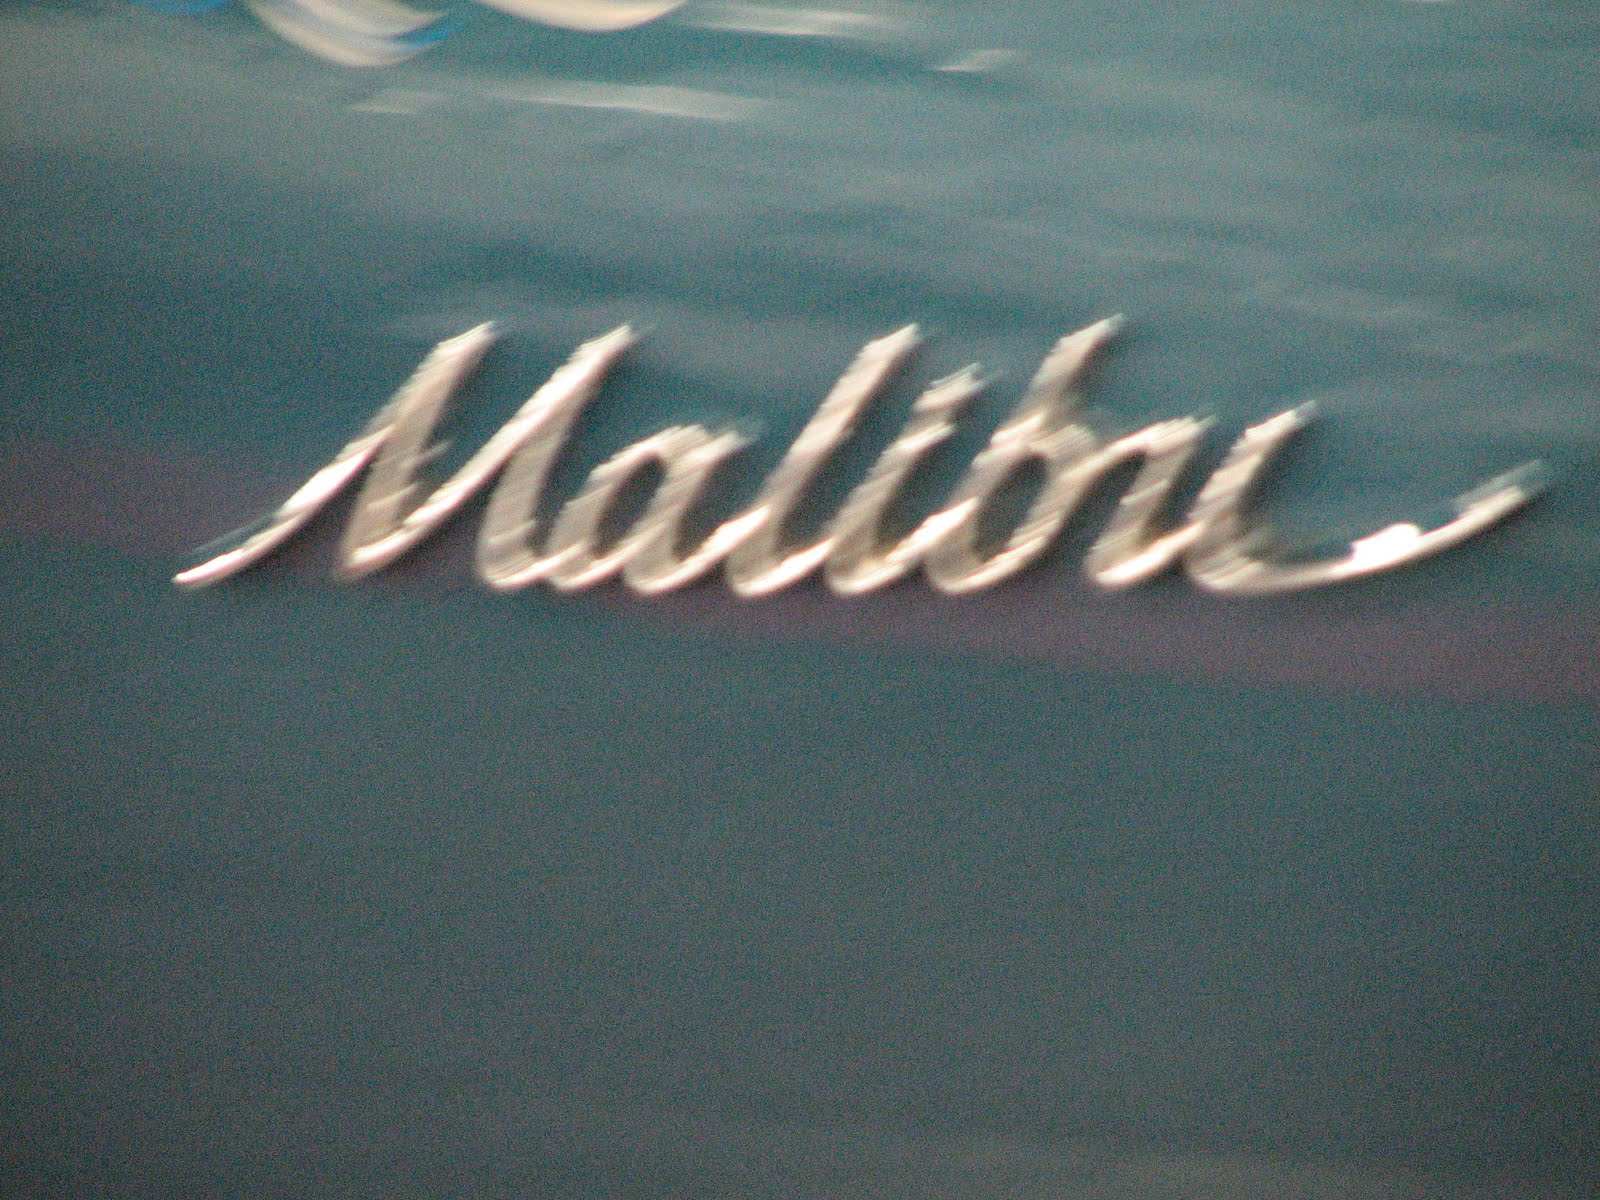 1979 Chevy Malibu Parts Catalog